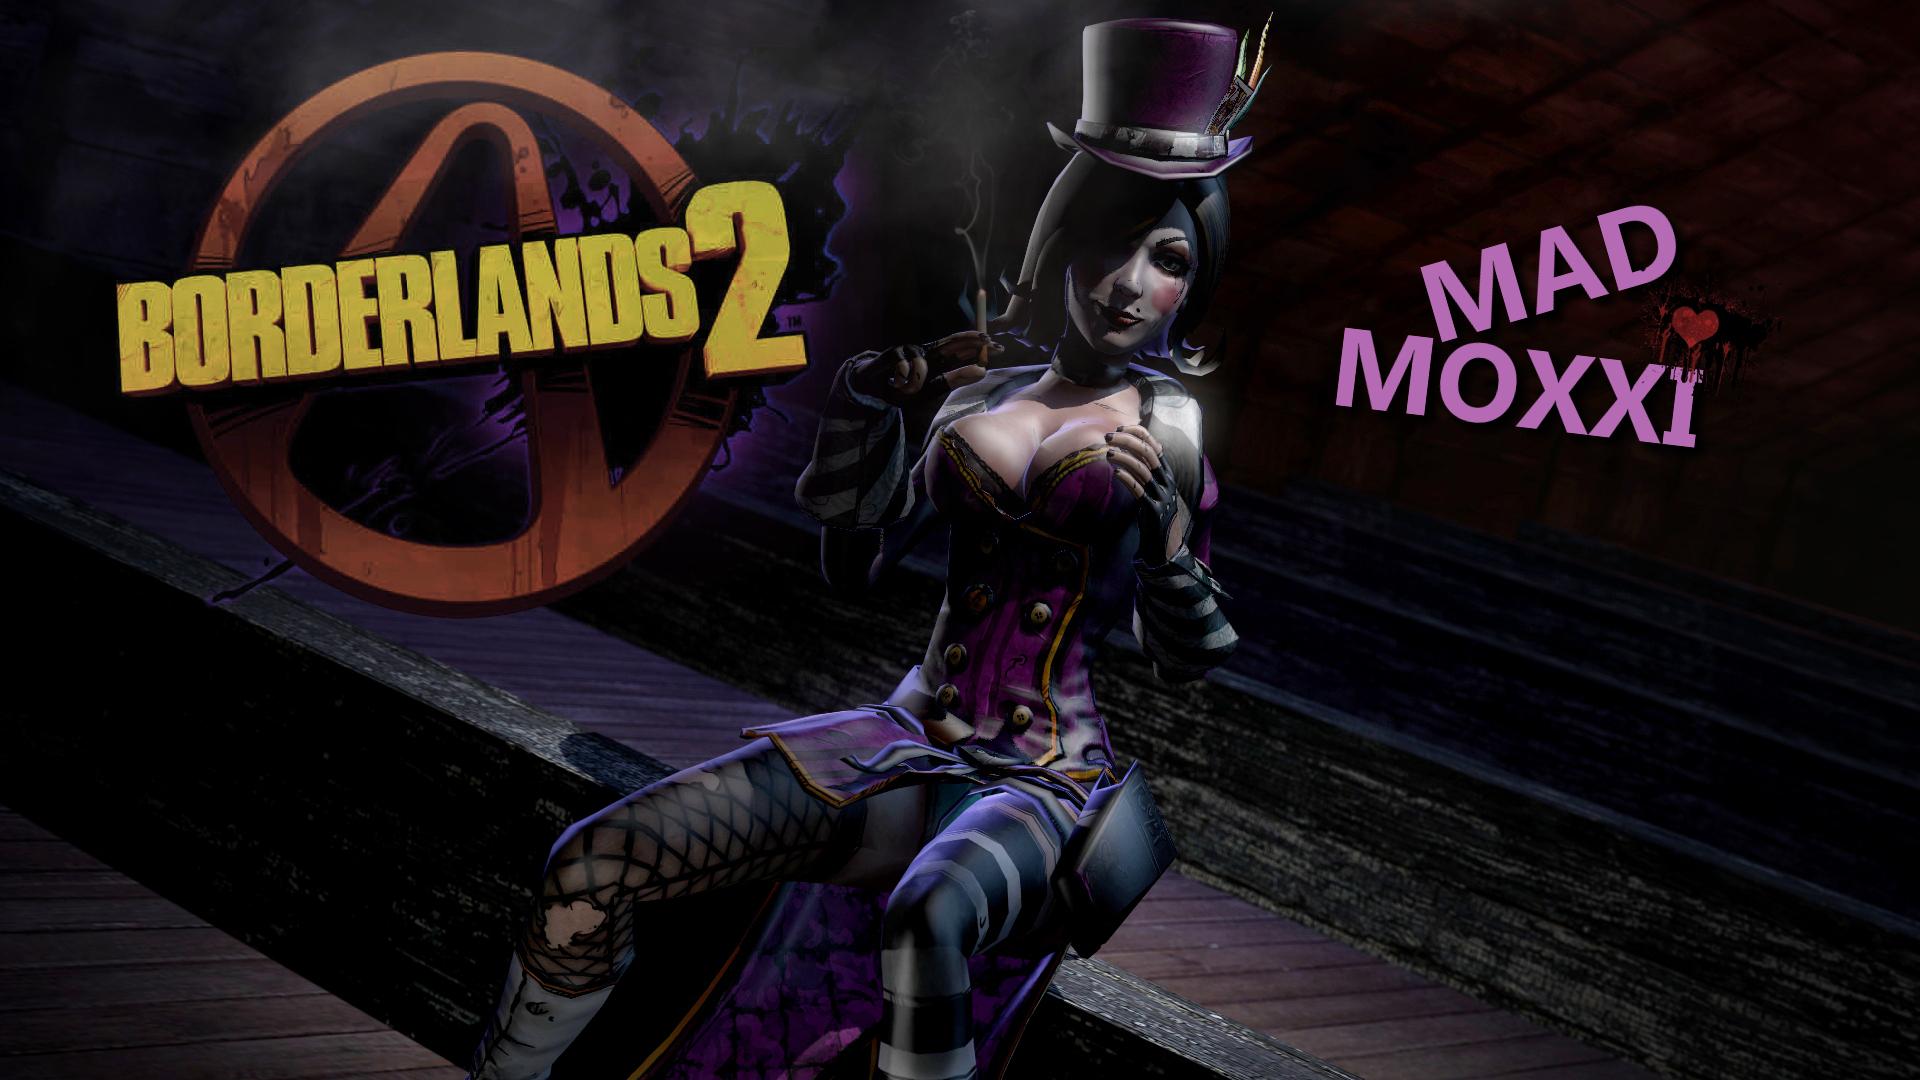 BORDERLANDS 2 - MAD MOXXI Cosplayer: MonoAbel